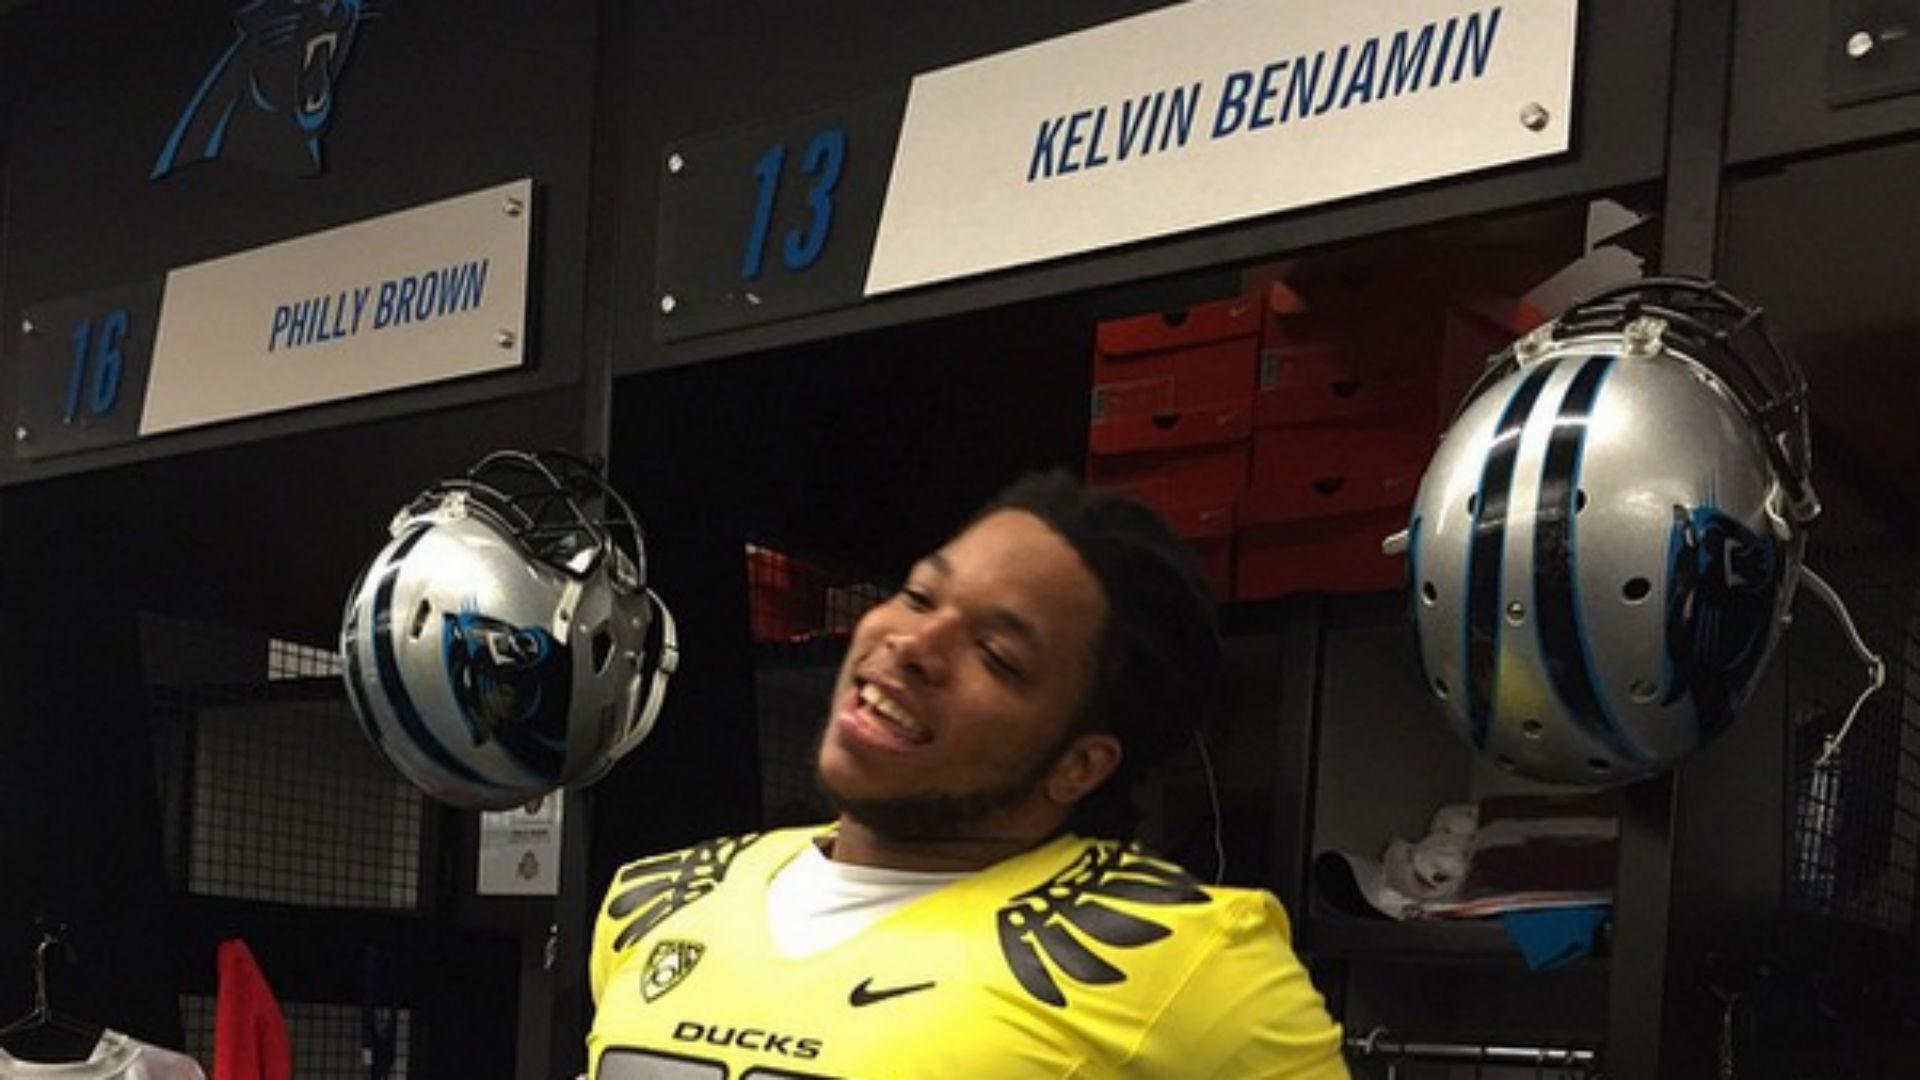 Panthers' Kelvin Benjamin loses bet, sports Oregon jersey ...